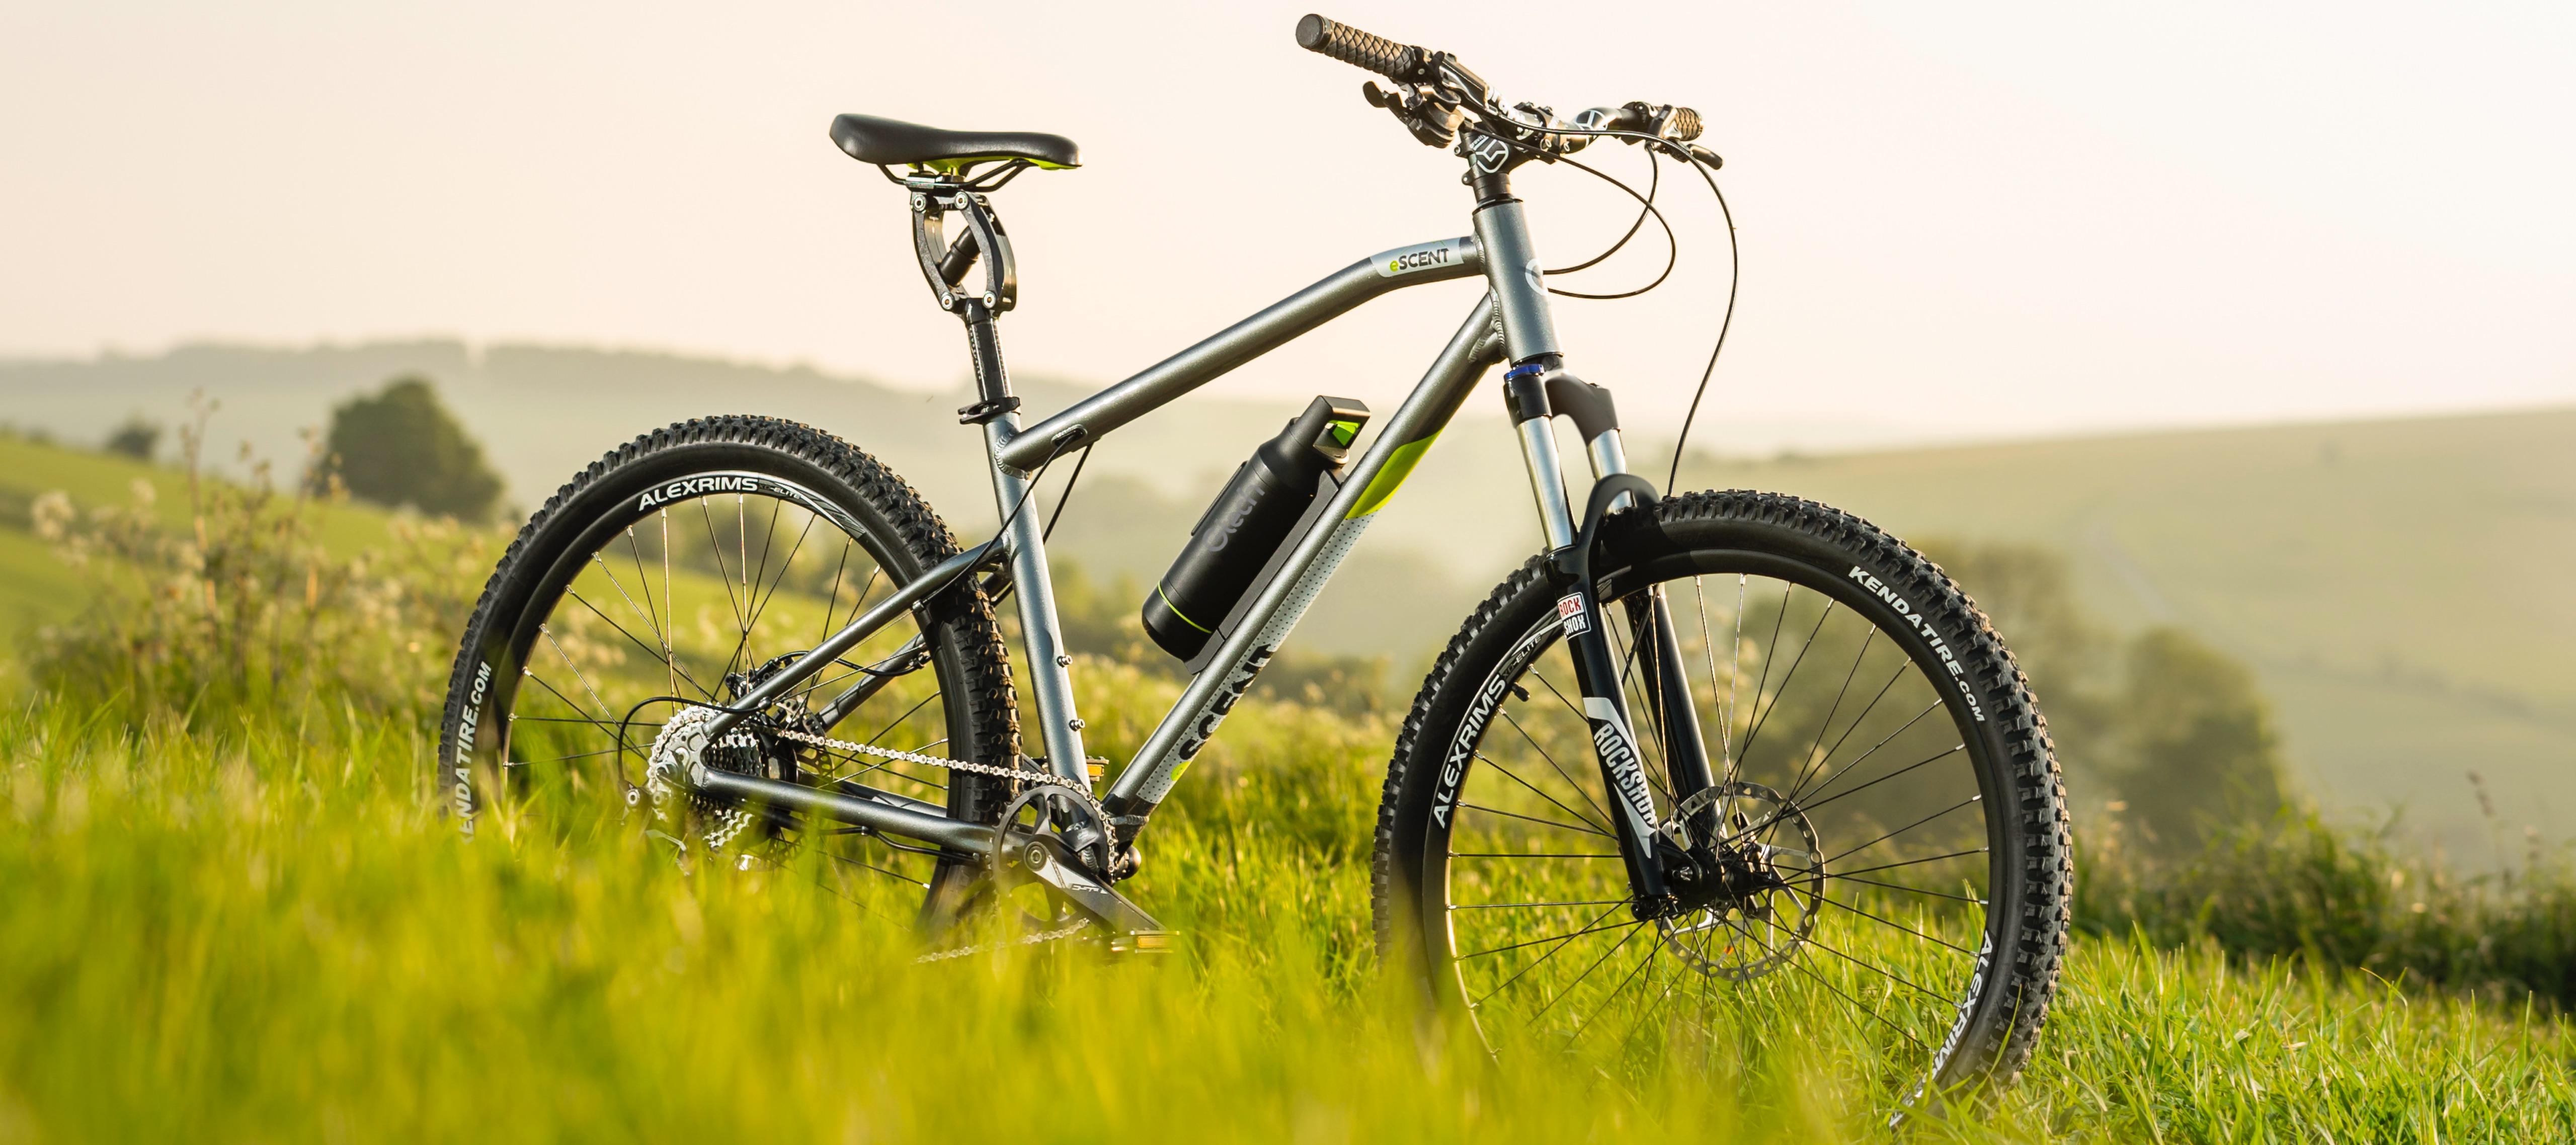 eScent electric mountain bike